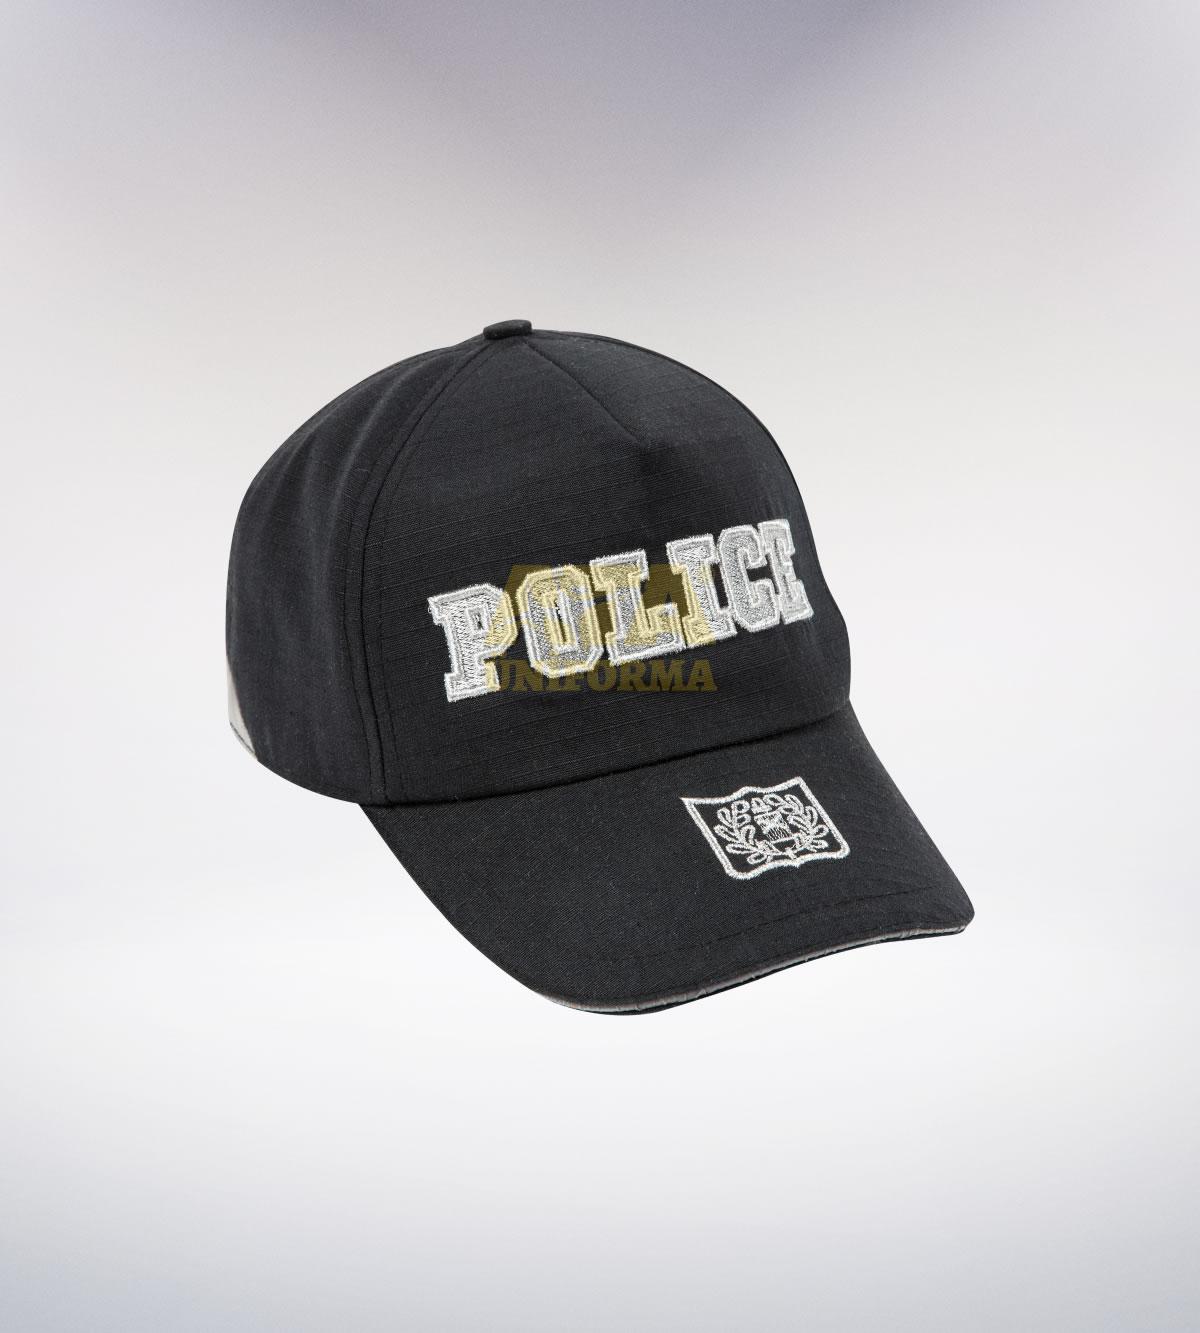 ATA-1104 Polis kepi - polis elbiseleri | polis  üniformaları | polis kıyafetleri